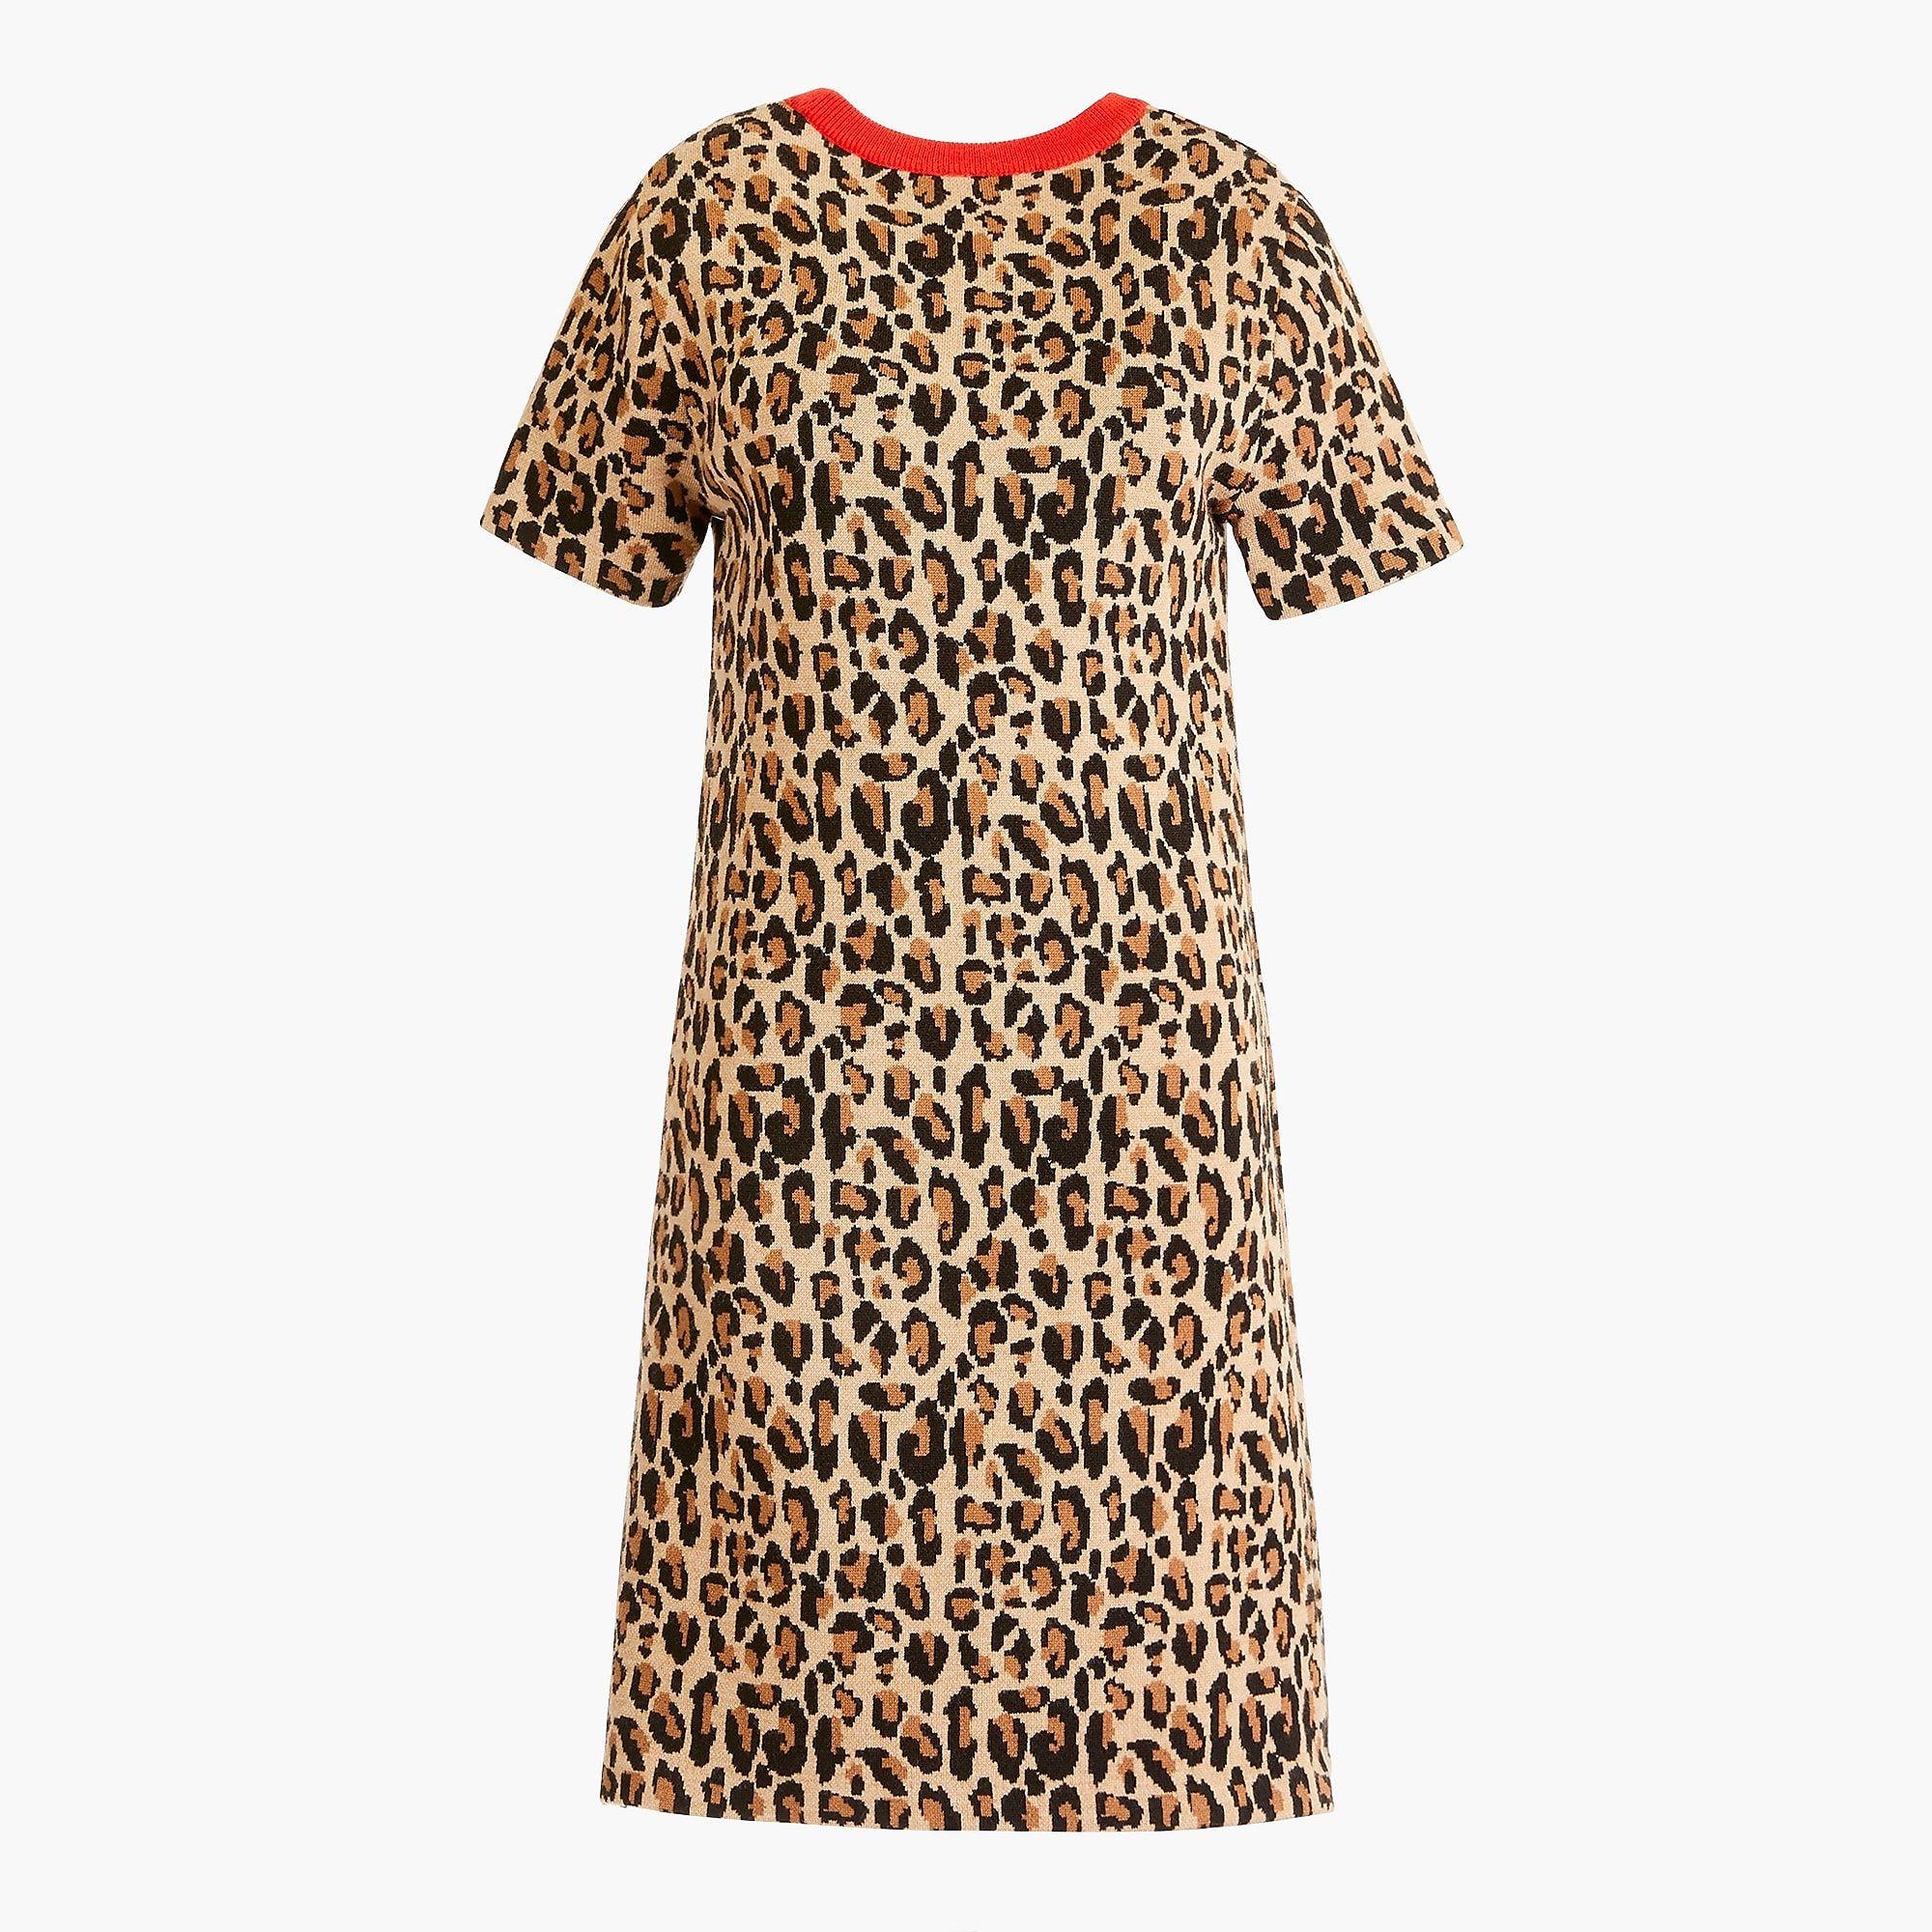 3977de4adc7c Demylee™ X J.Crew open-front sweater-blazer in leopard print : Women  sweaters | J.Crew